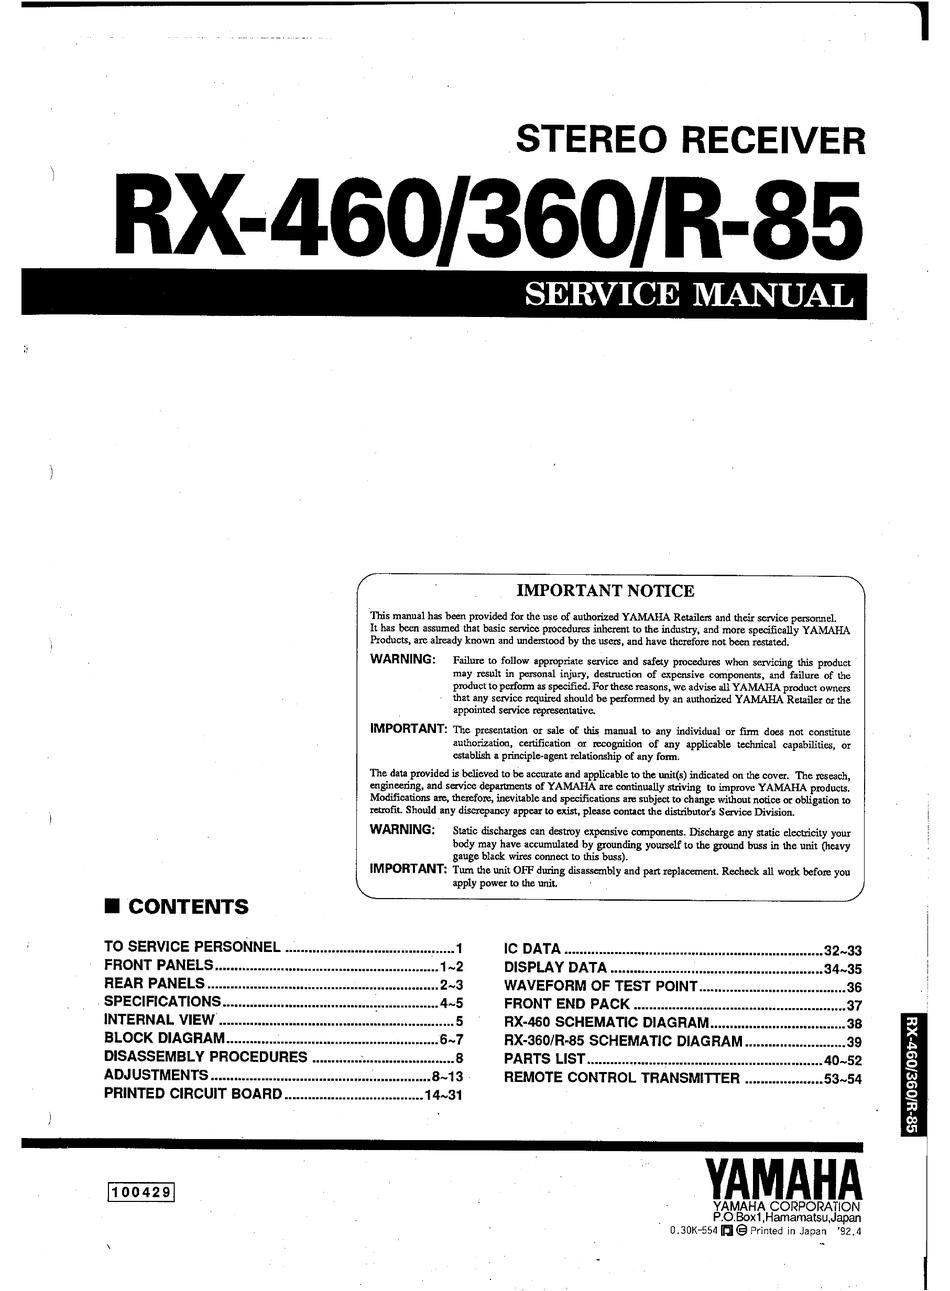 Yamaha Rx 460 Service Manual Pdf Download Manualslib